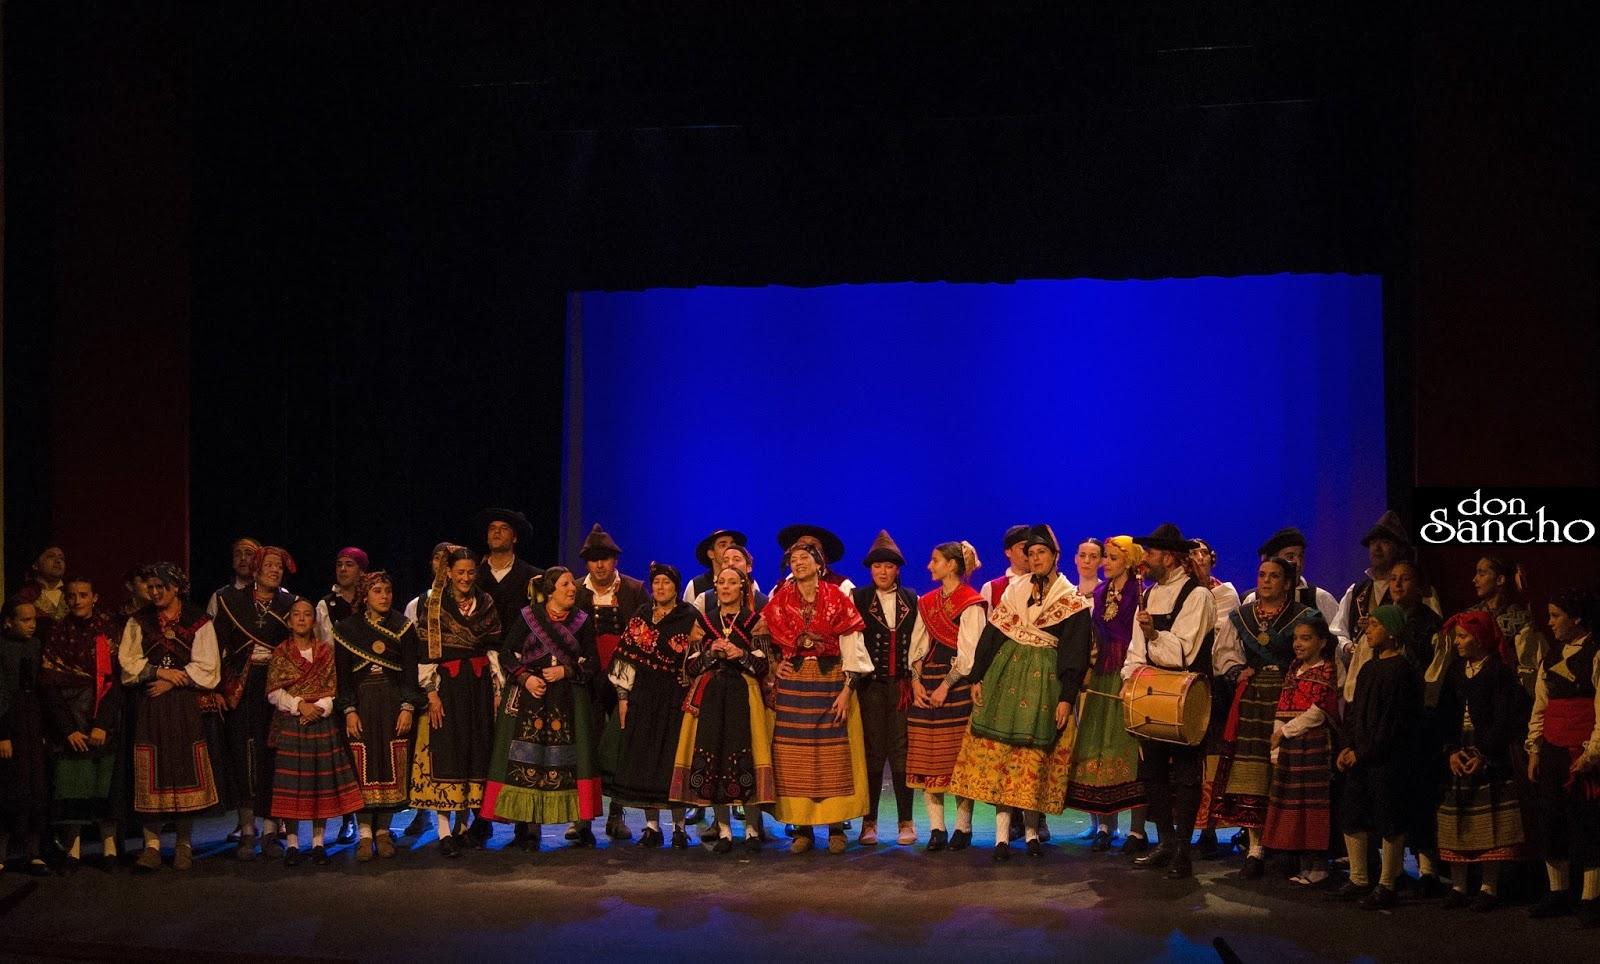 DON SANCHO. Difusión de la Cultura Tradicional de Zamora ... - photo#28